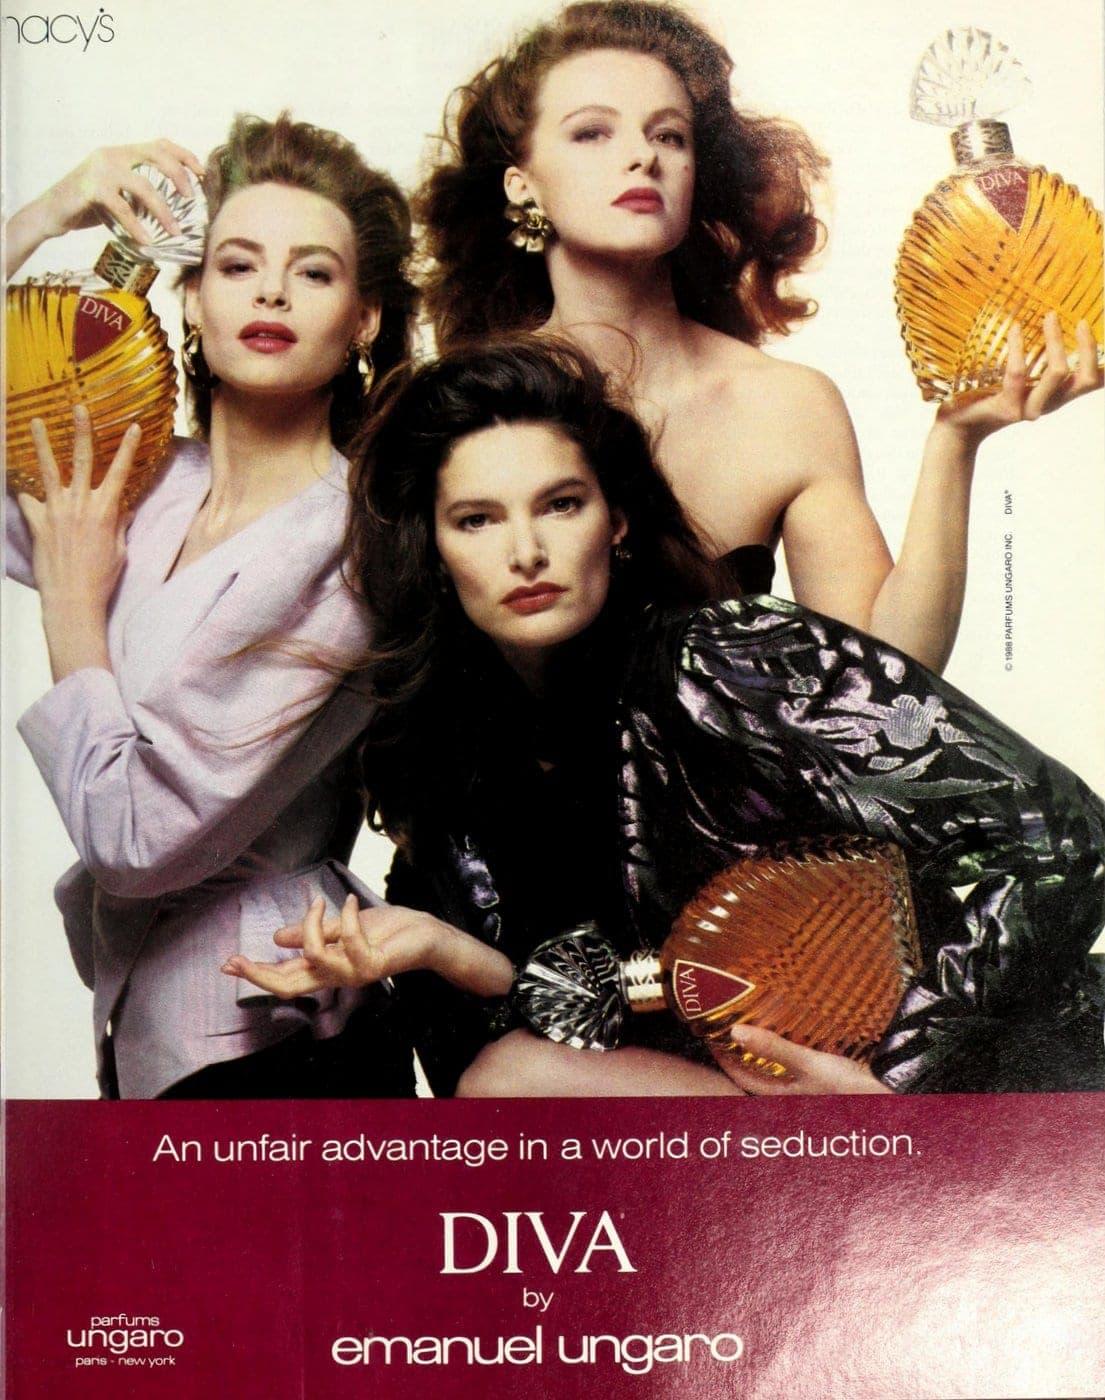 Diva by Emanuel Ungaro fragrance from 1988